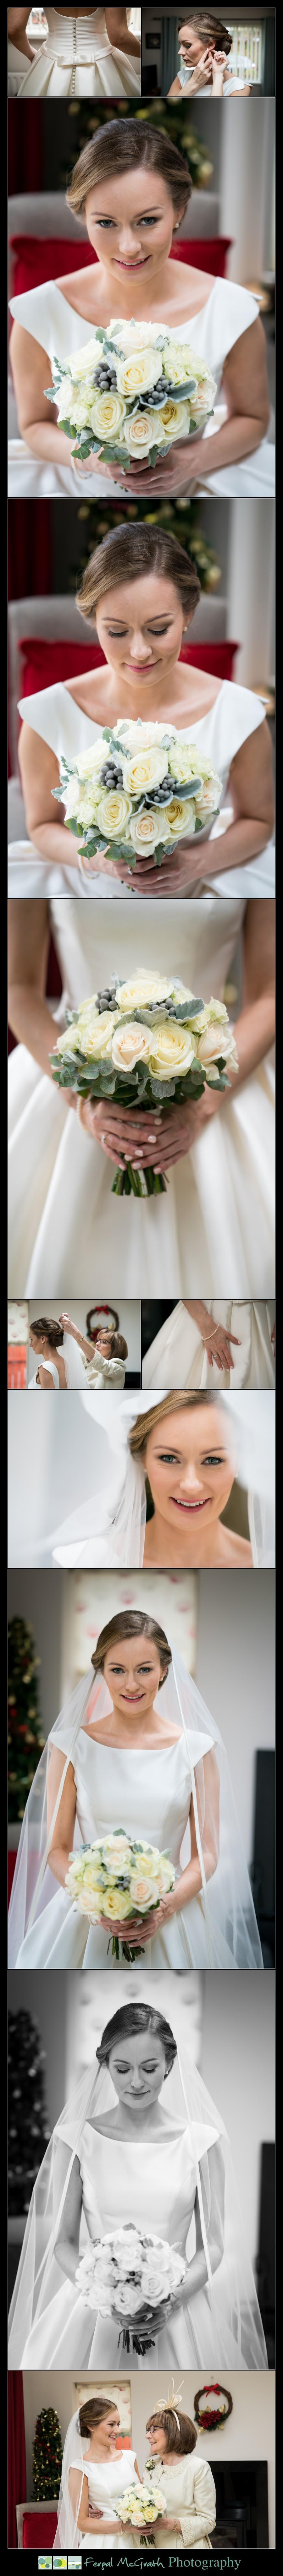 Harveys Point Hotel Winter Weddings stunning bride photos on the morning of her wedding